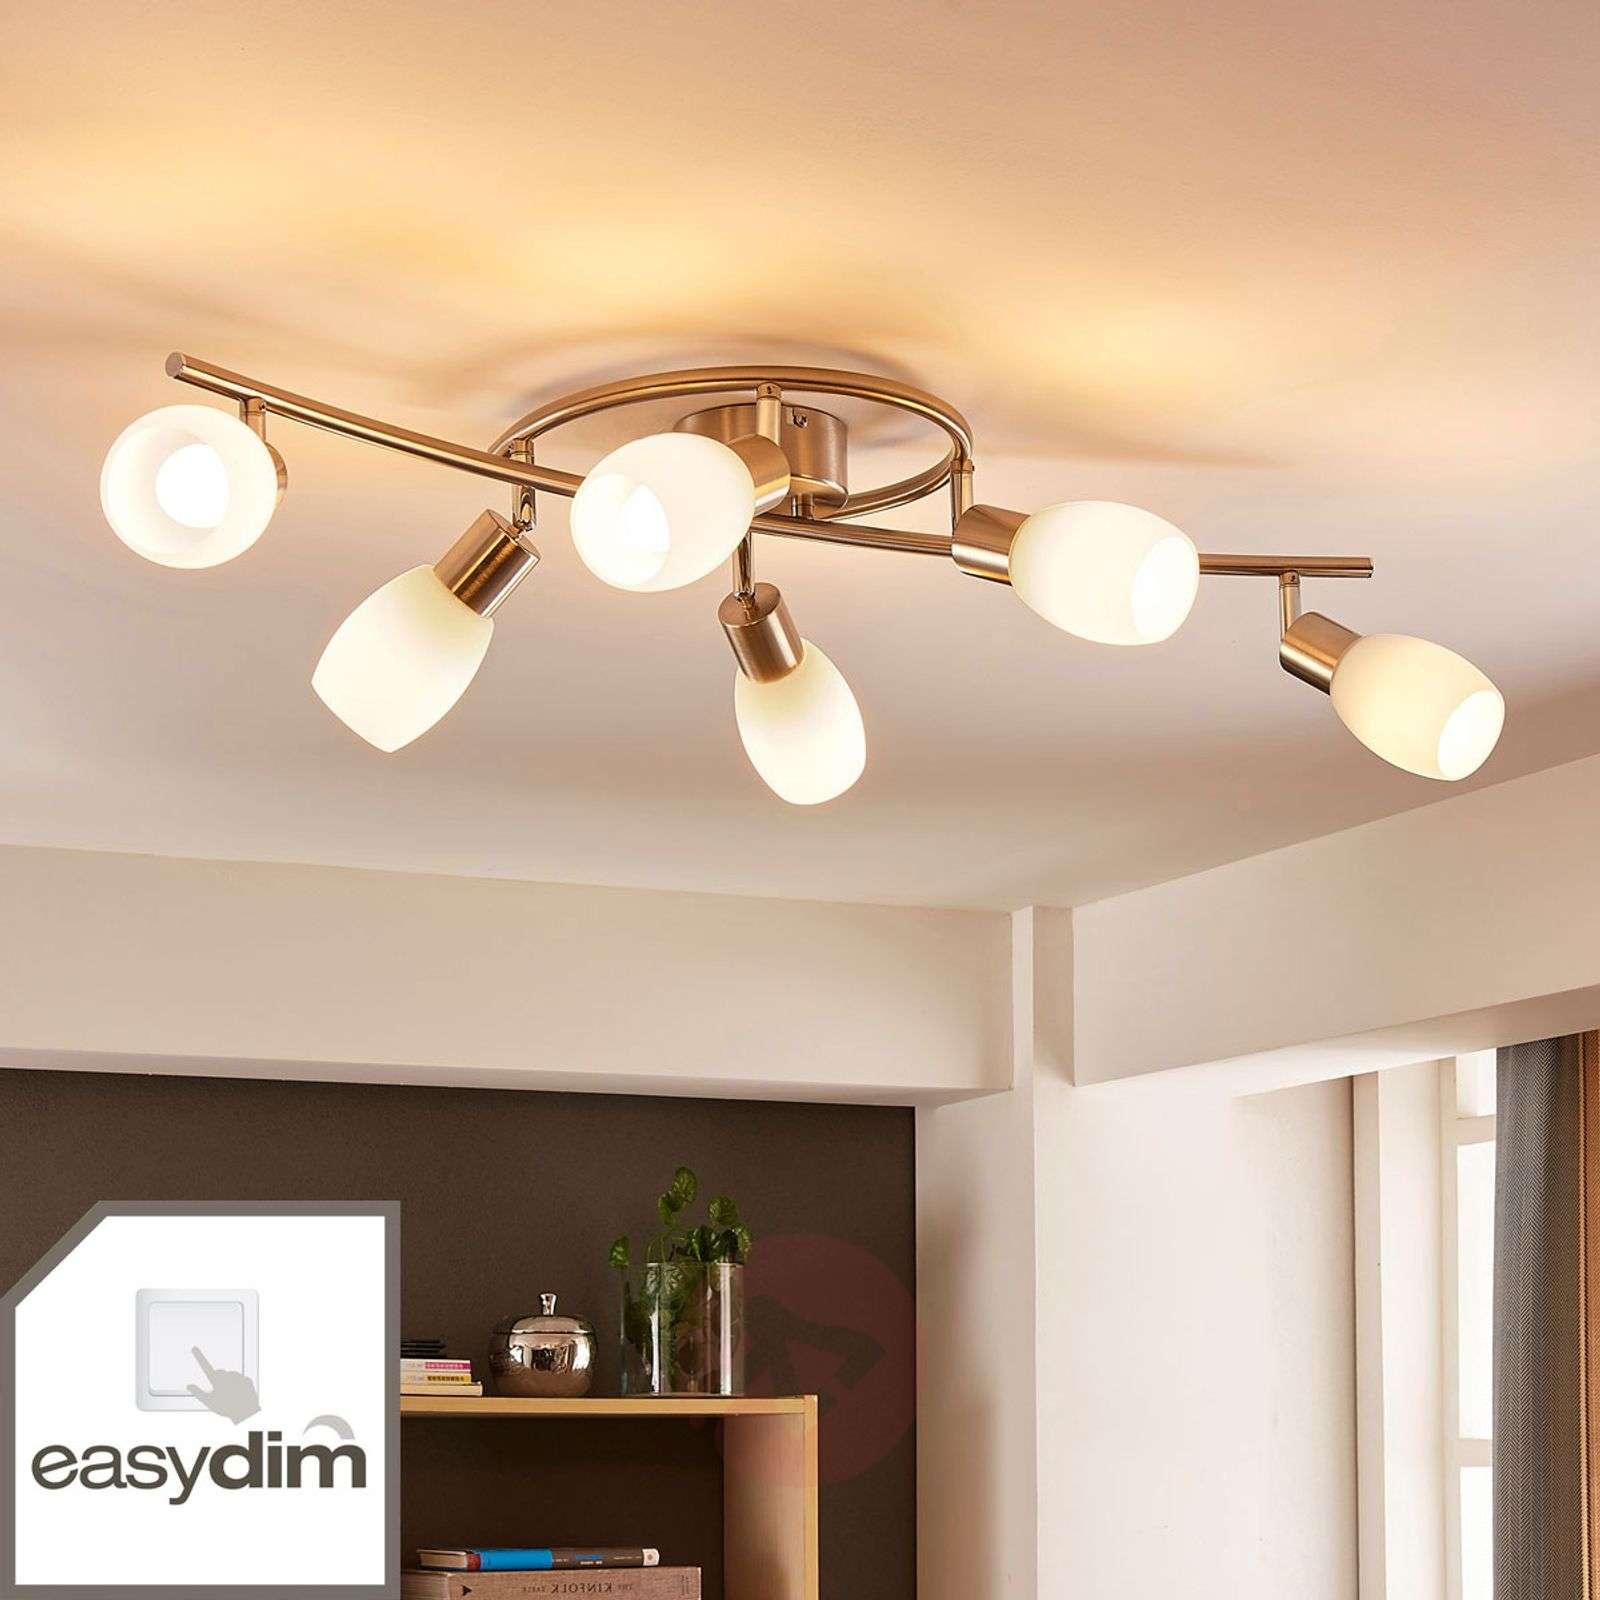 sports shoes 2c71f 67327 Bright LED ceiling light Arda, Easydim